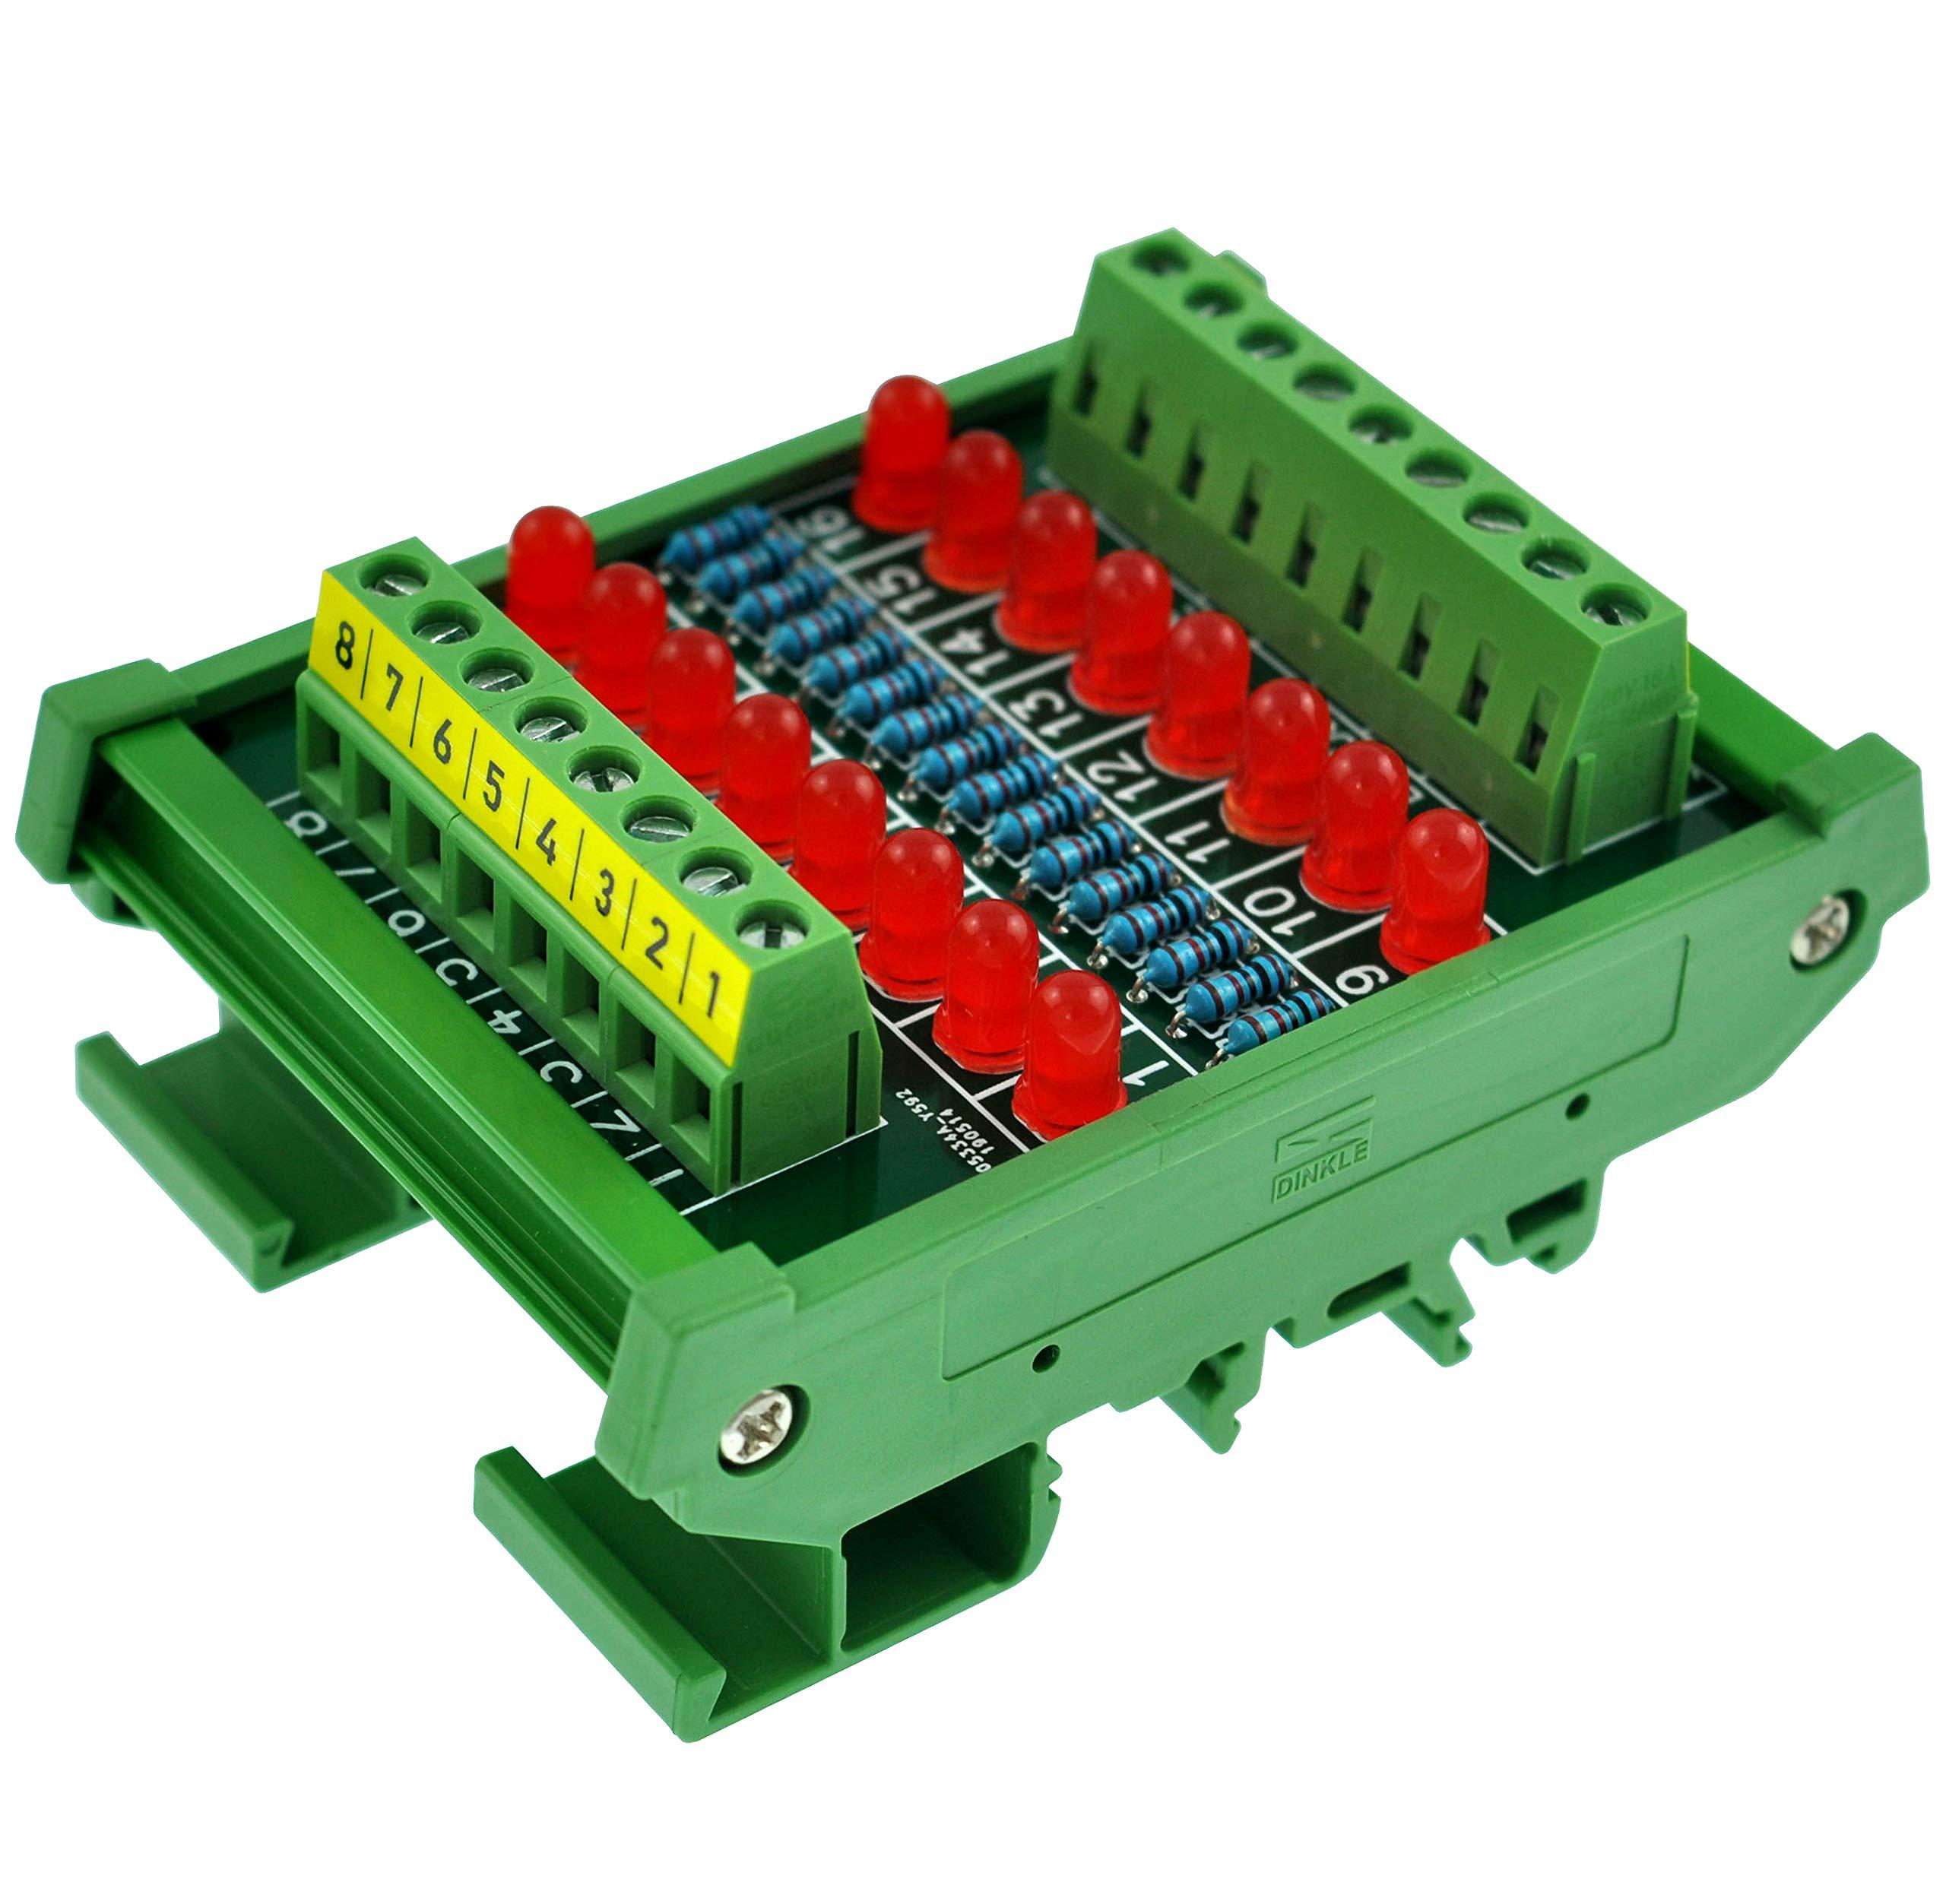 CZH-LABS DIN Rail Mount 16 LEDs Indicator Light Module, Support 5~50VDC Common Positive/Negative